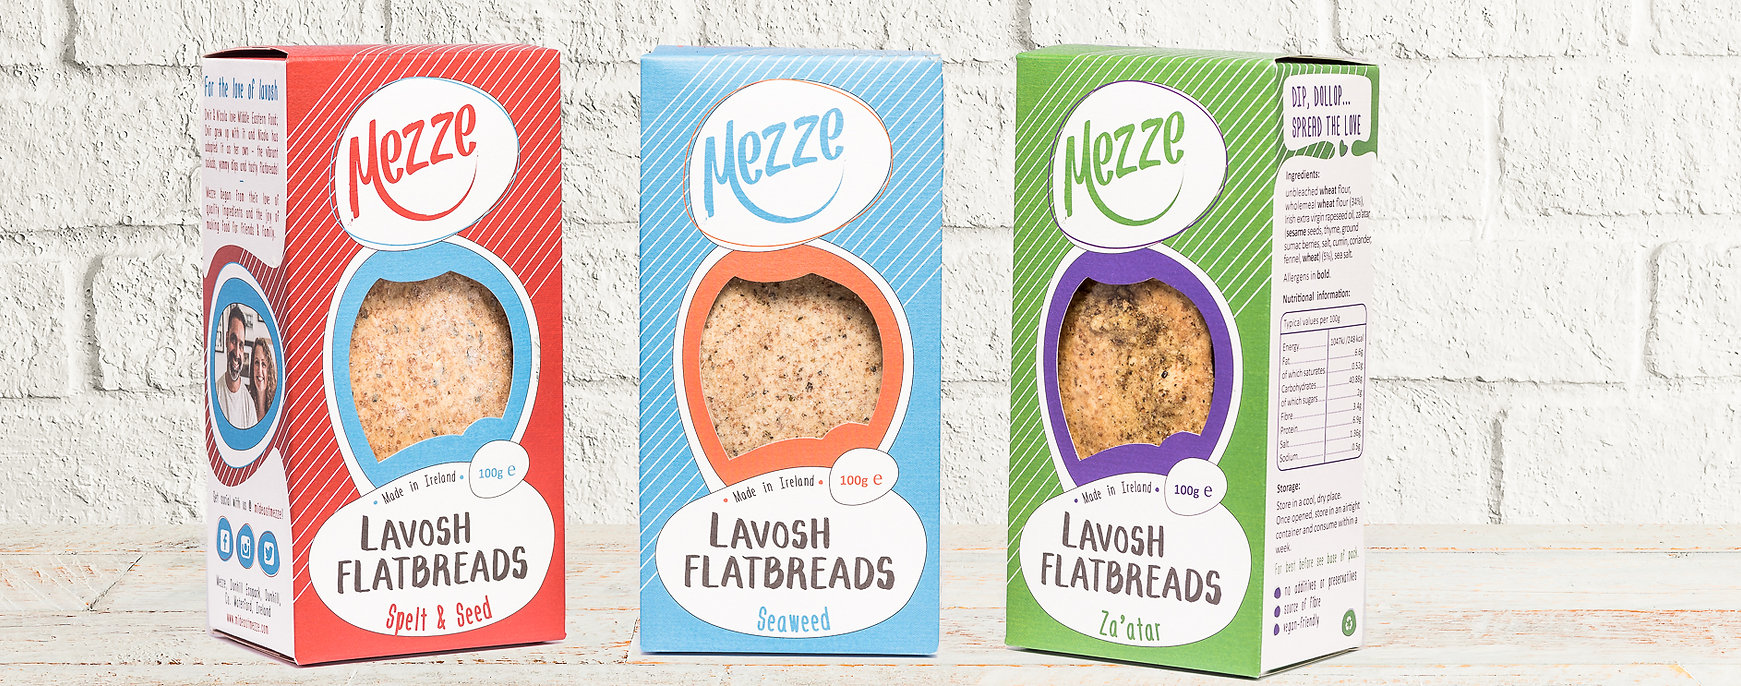 mezze-product-21.jpg